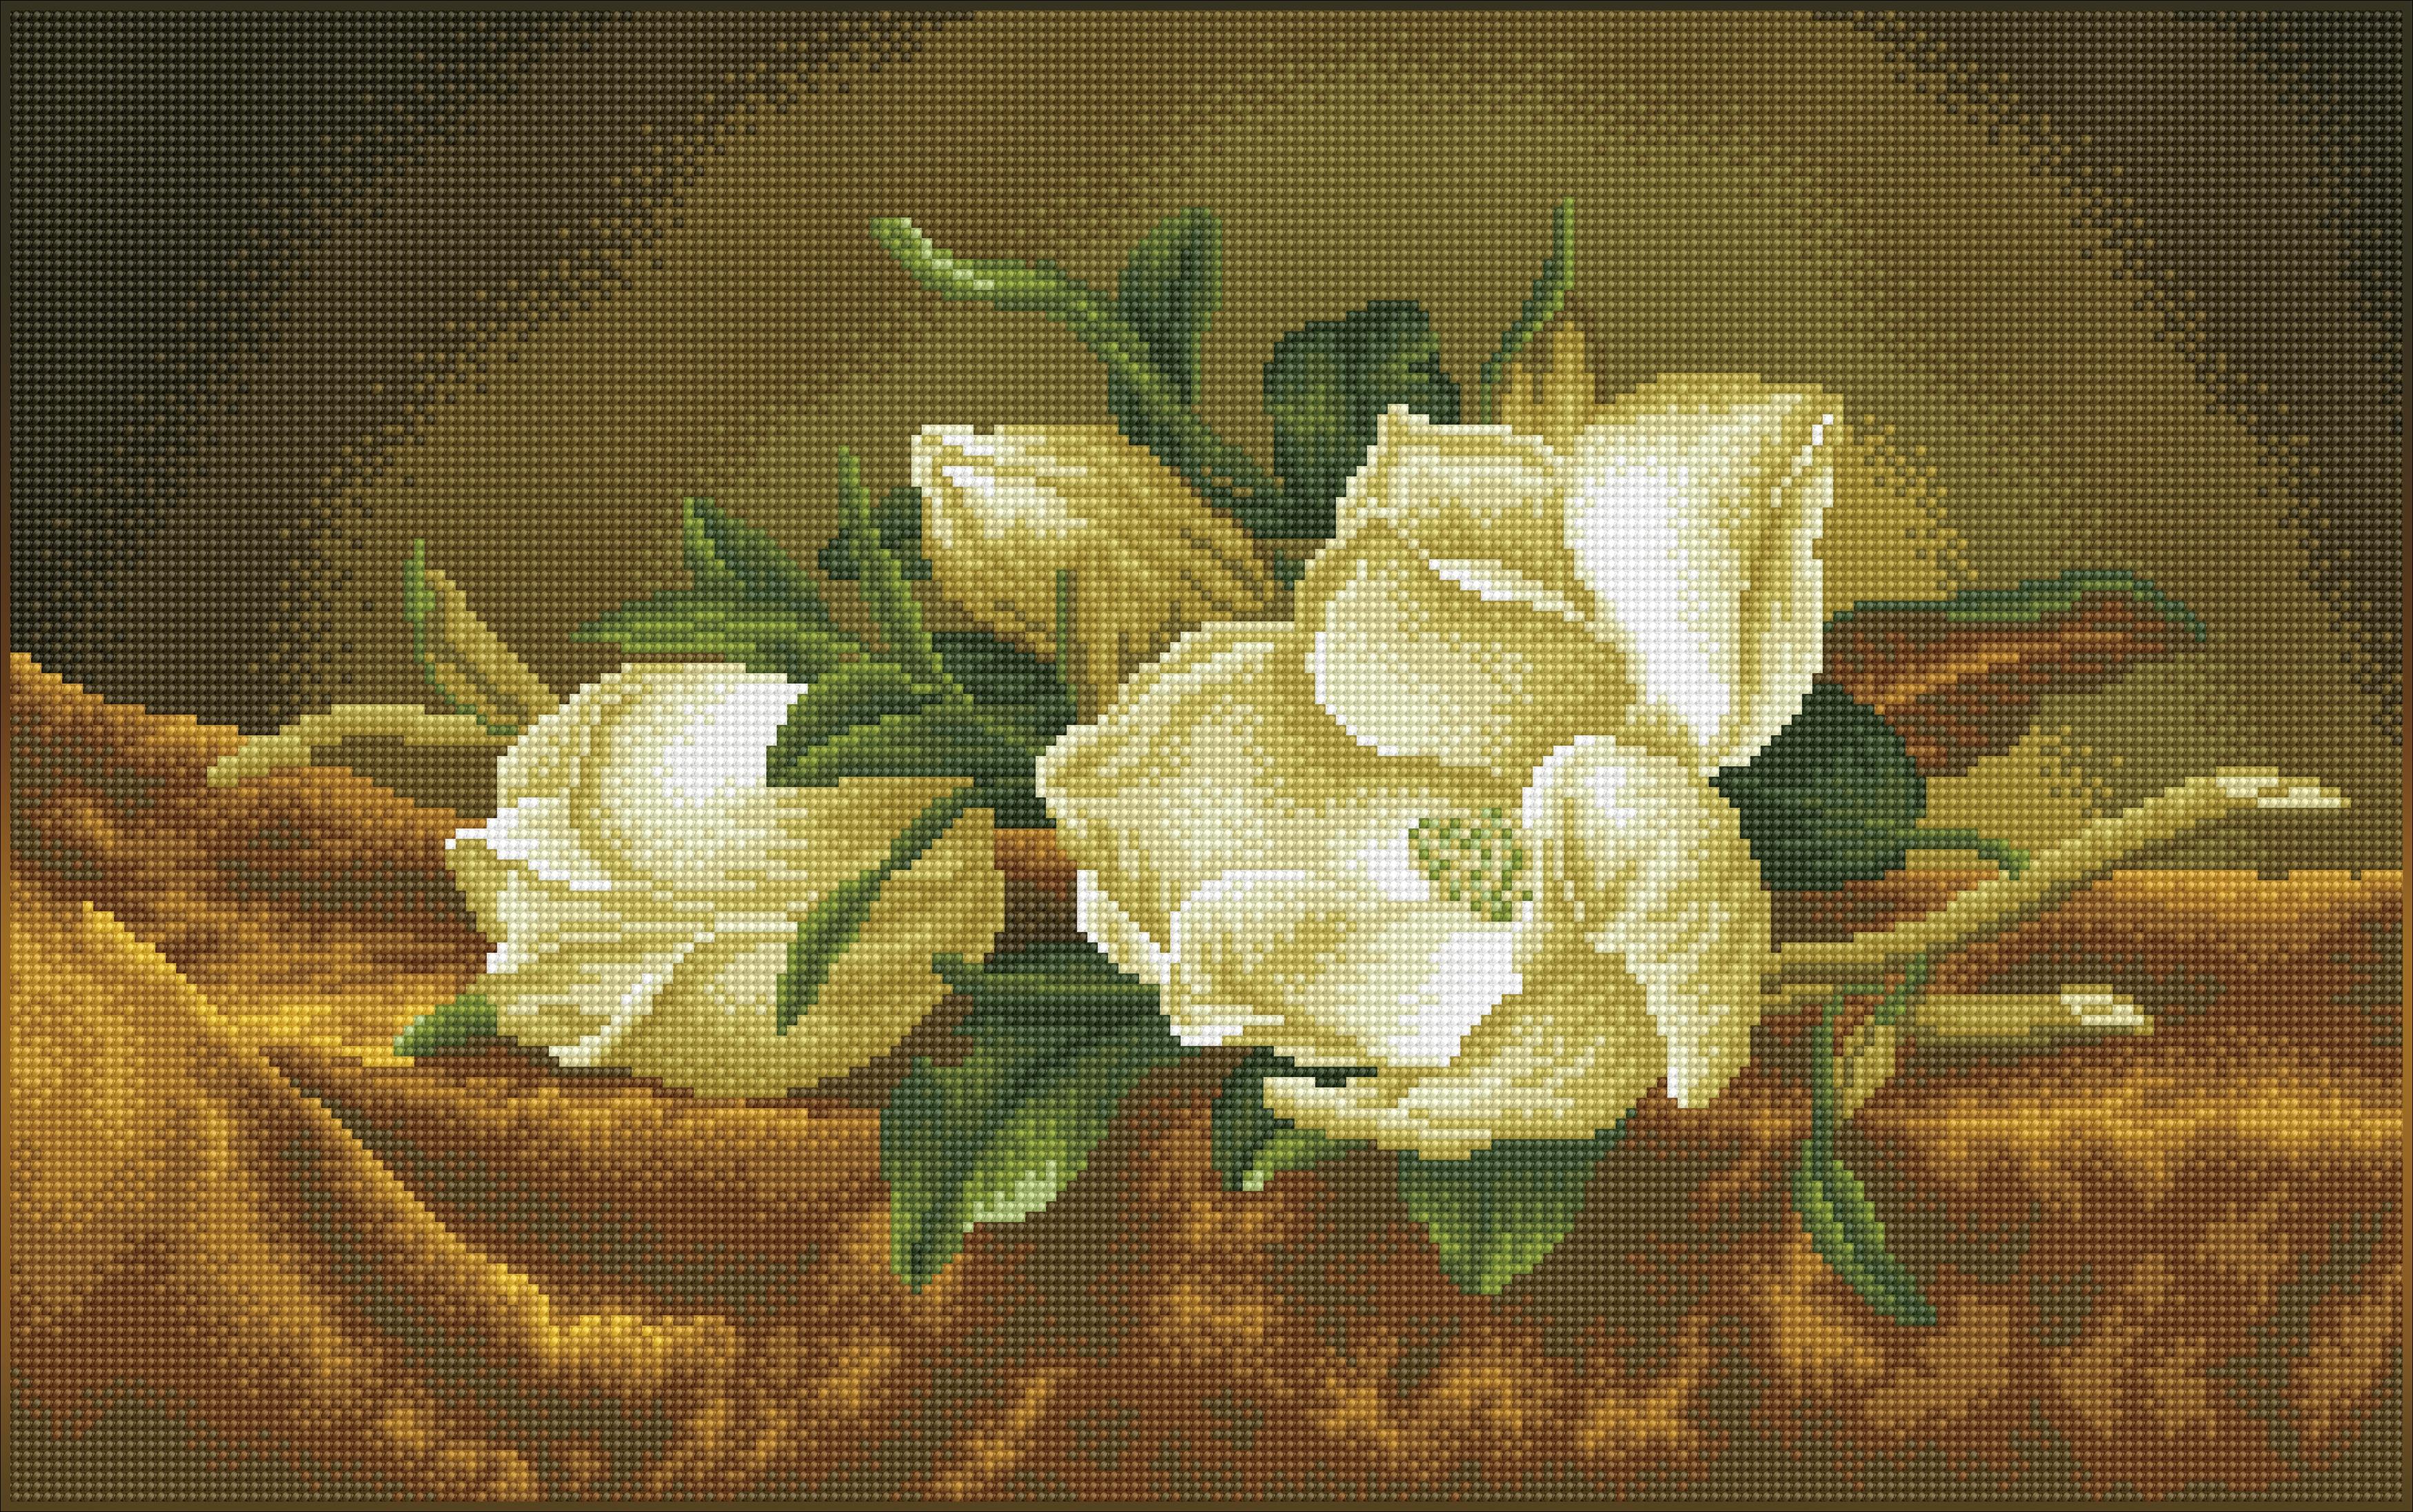 Diamond Dotz Diamond Embroidery Facet Art Kit 26X16.1-Magnolias on Gold Velvet (Heade)